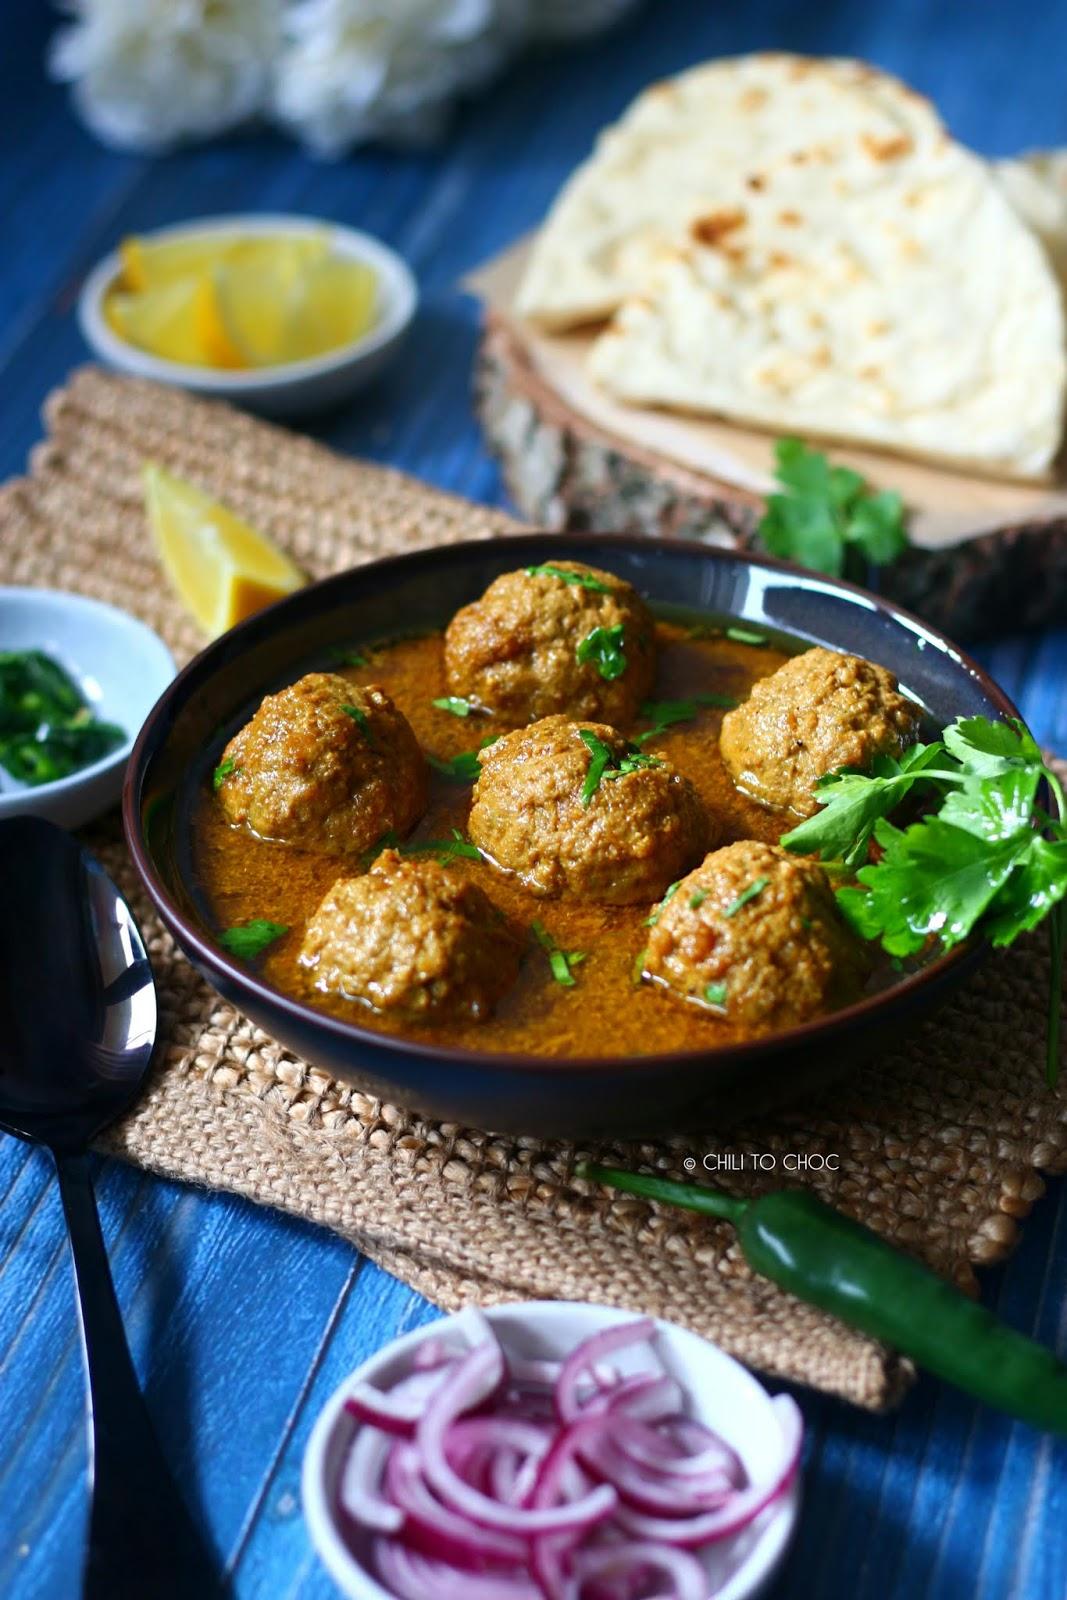 Beef Kofta Curry (Pakistani Meatballs Curry)